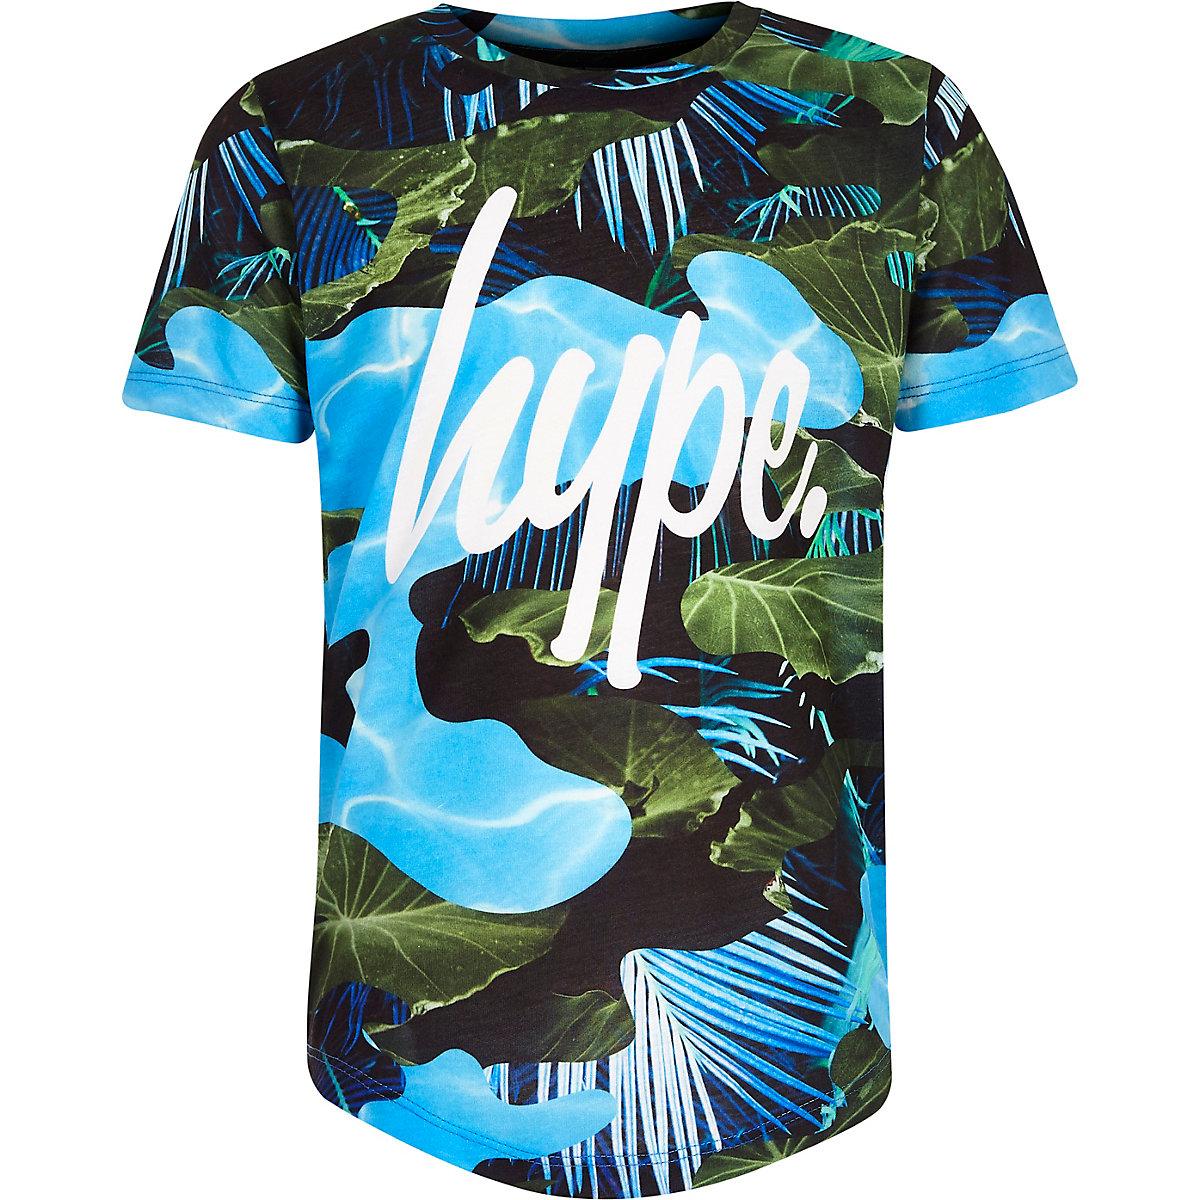 Boys blue Hype leaf print T-shirt